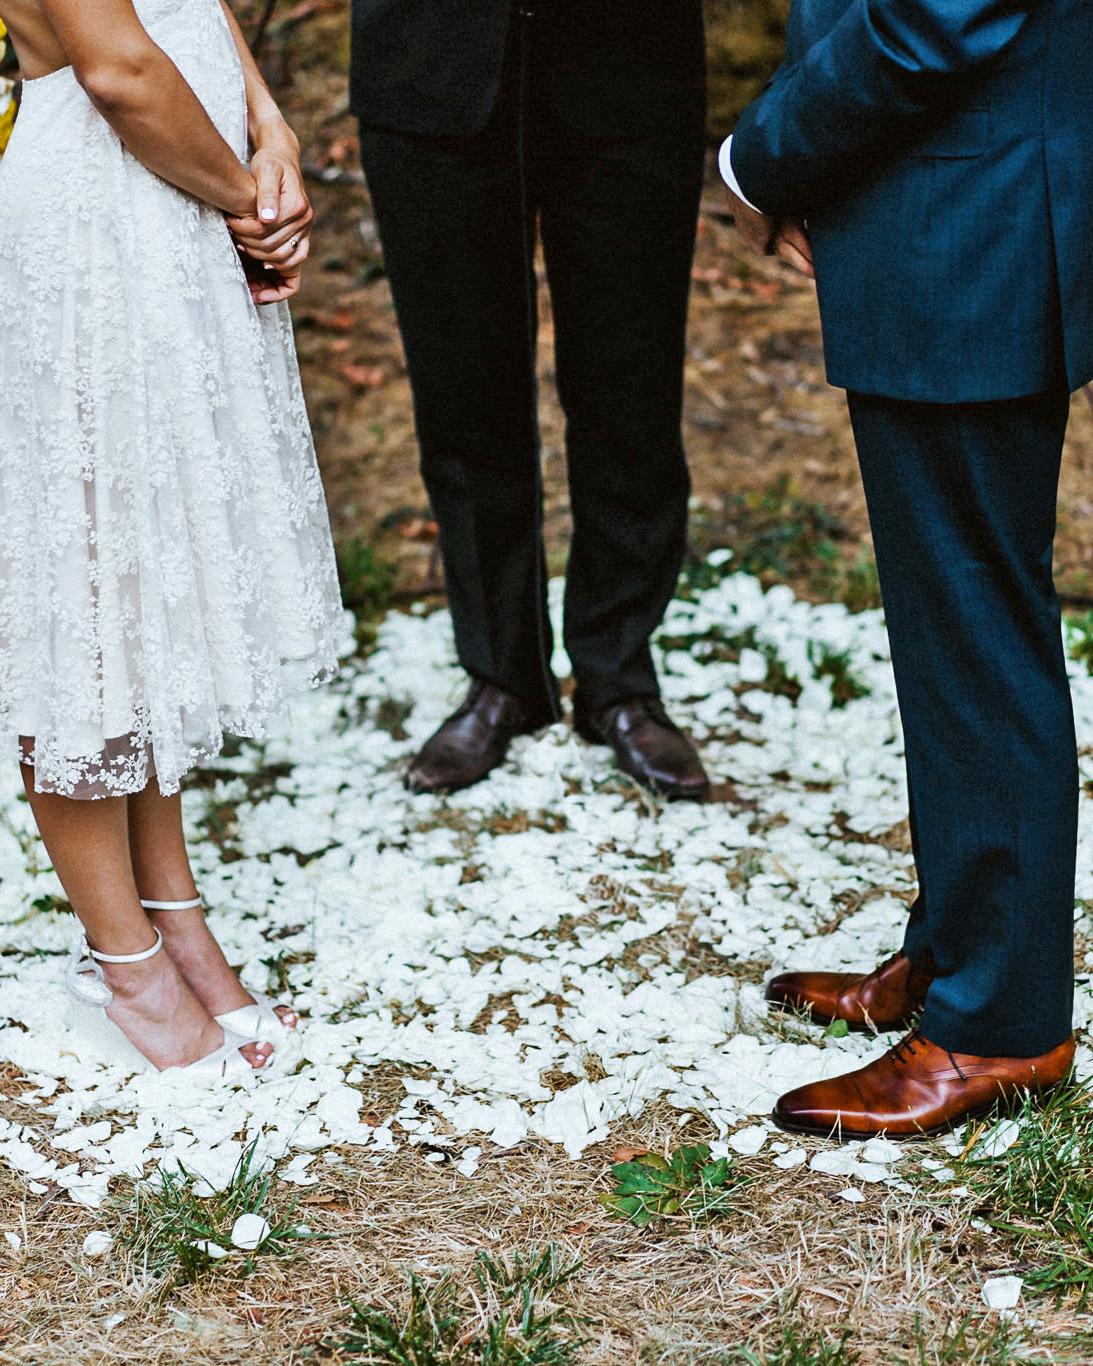 amy nick wedding ceremony petals feet